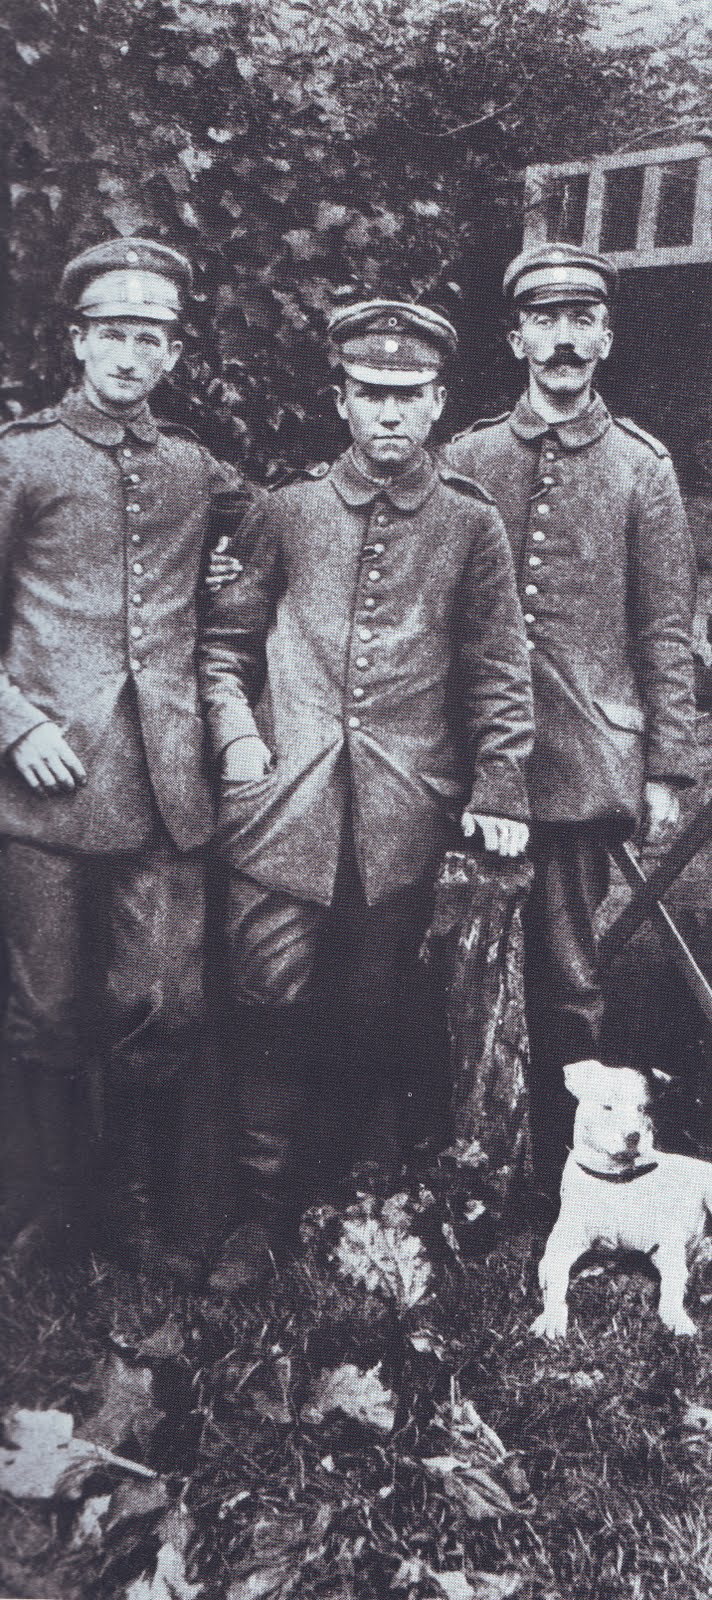 Mein Führer  Uniformes de Hitler 9f1f6215112